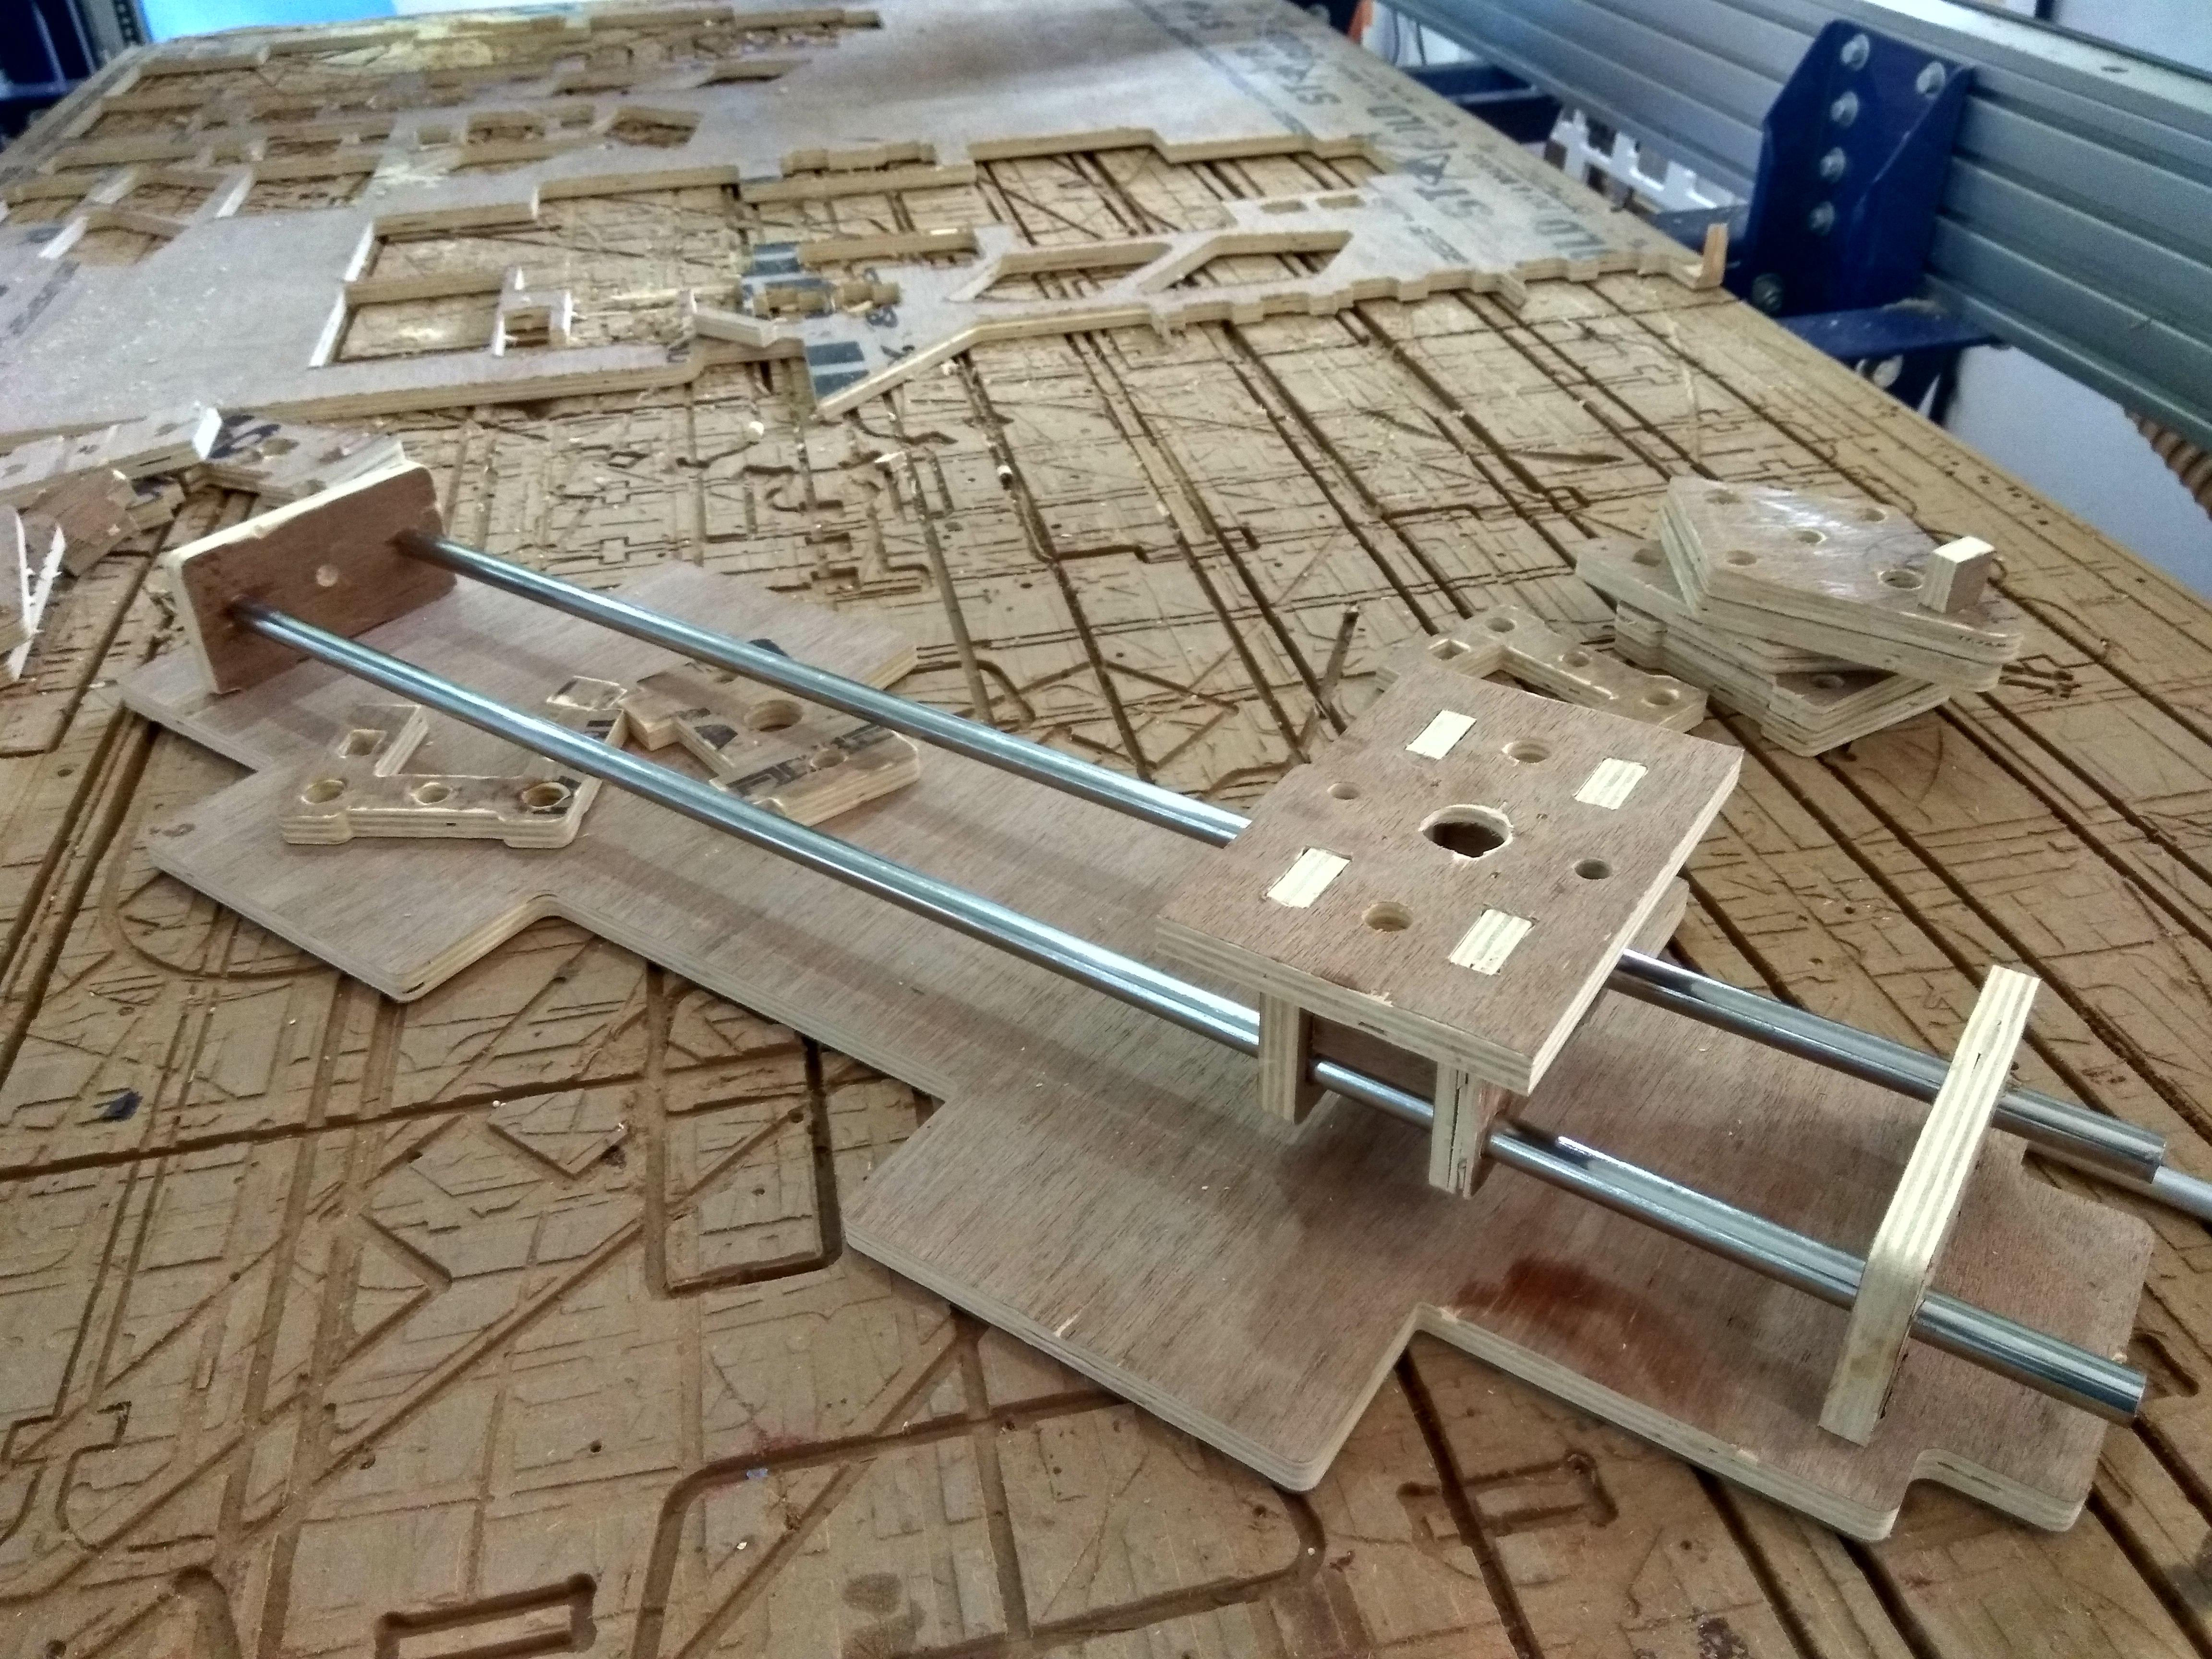 4 axis foam cutter